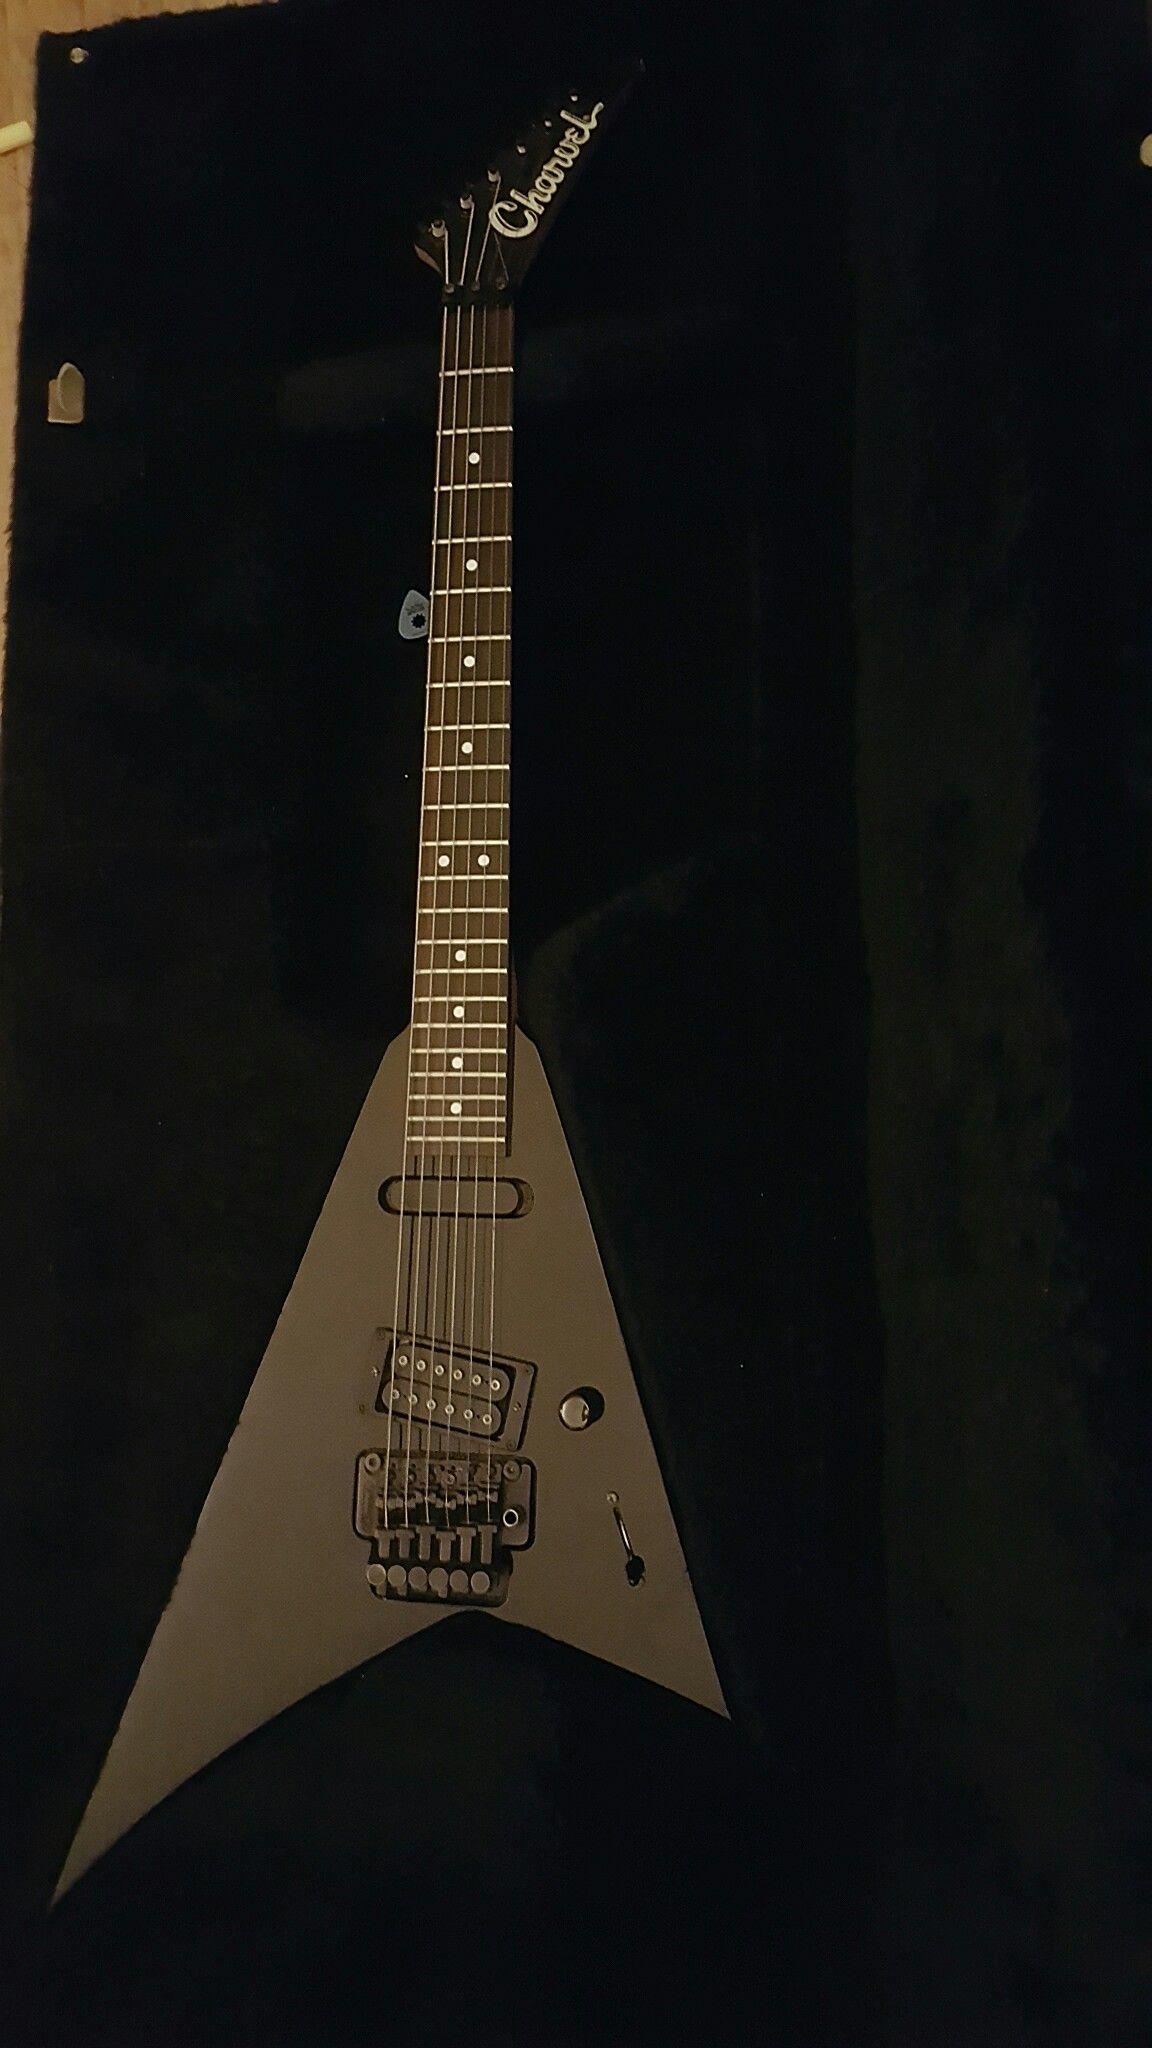 1990 Randy Rhoads Charvel Jackson Avenger Guitar In 2018 2009 Wiring Diagrams Heavy Metal Signature Bass Amps